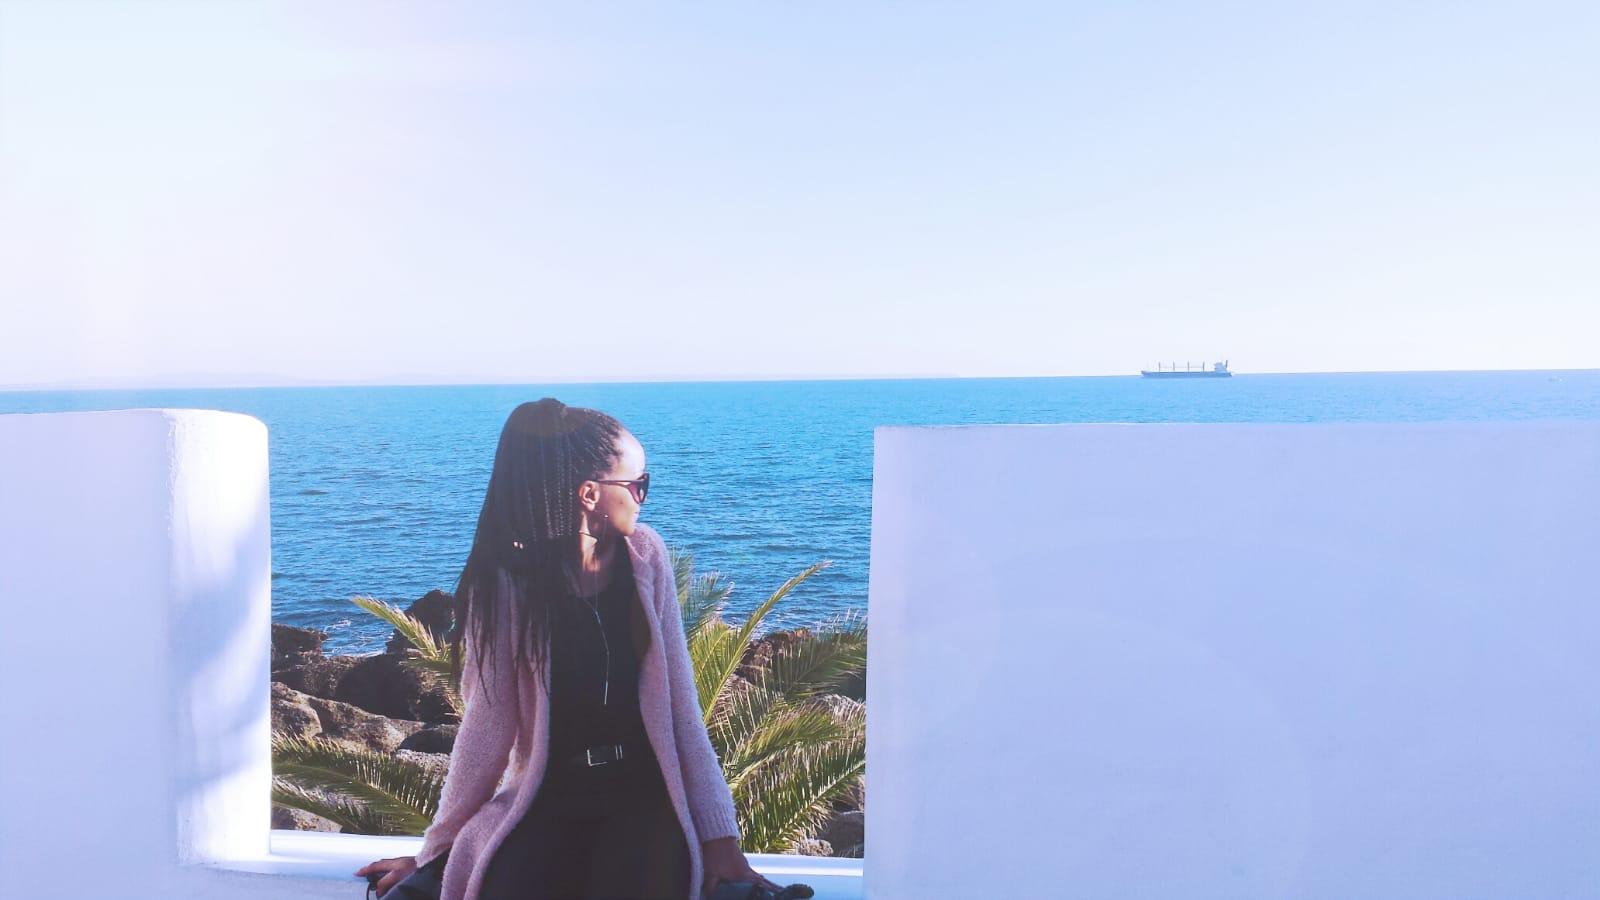 Autorin Luana im Urlaub, (C) Luana Tavares